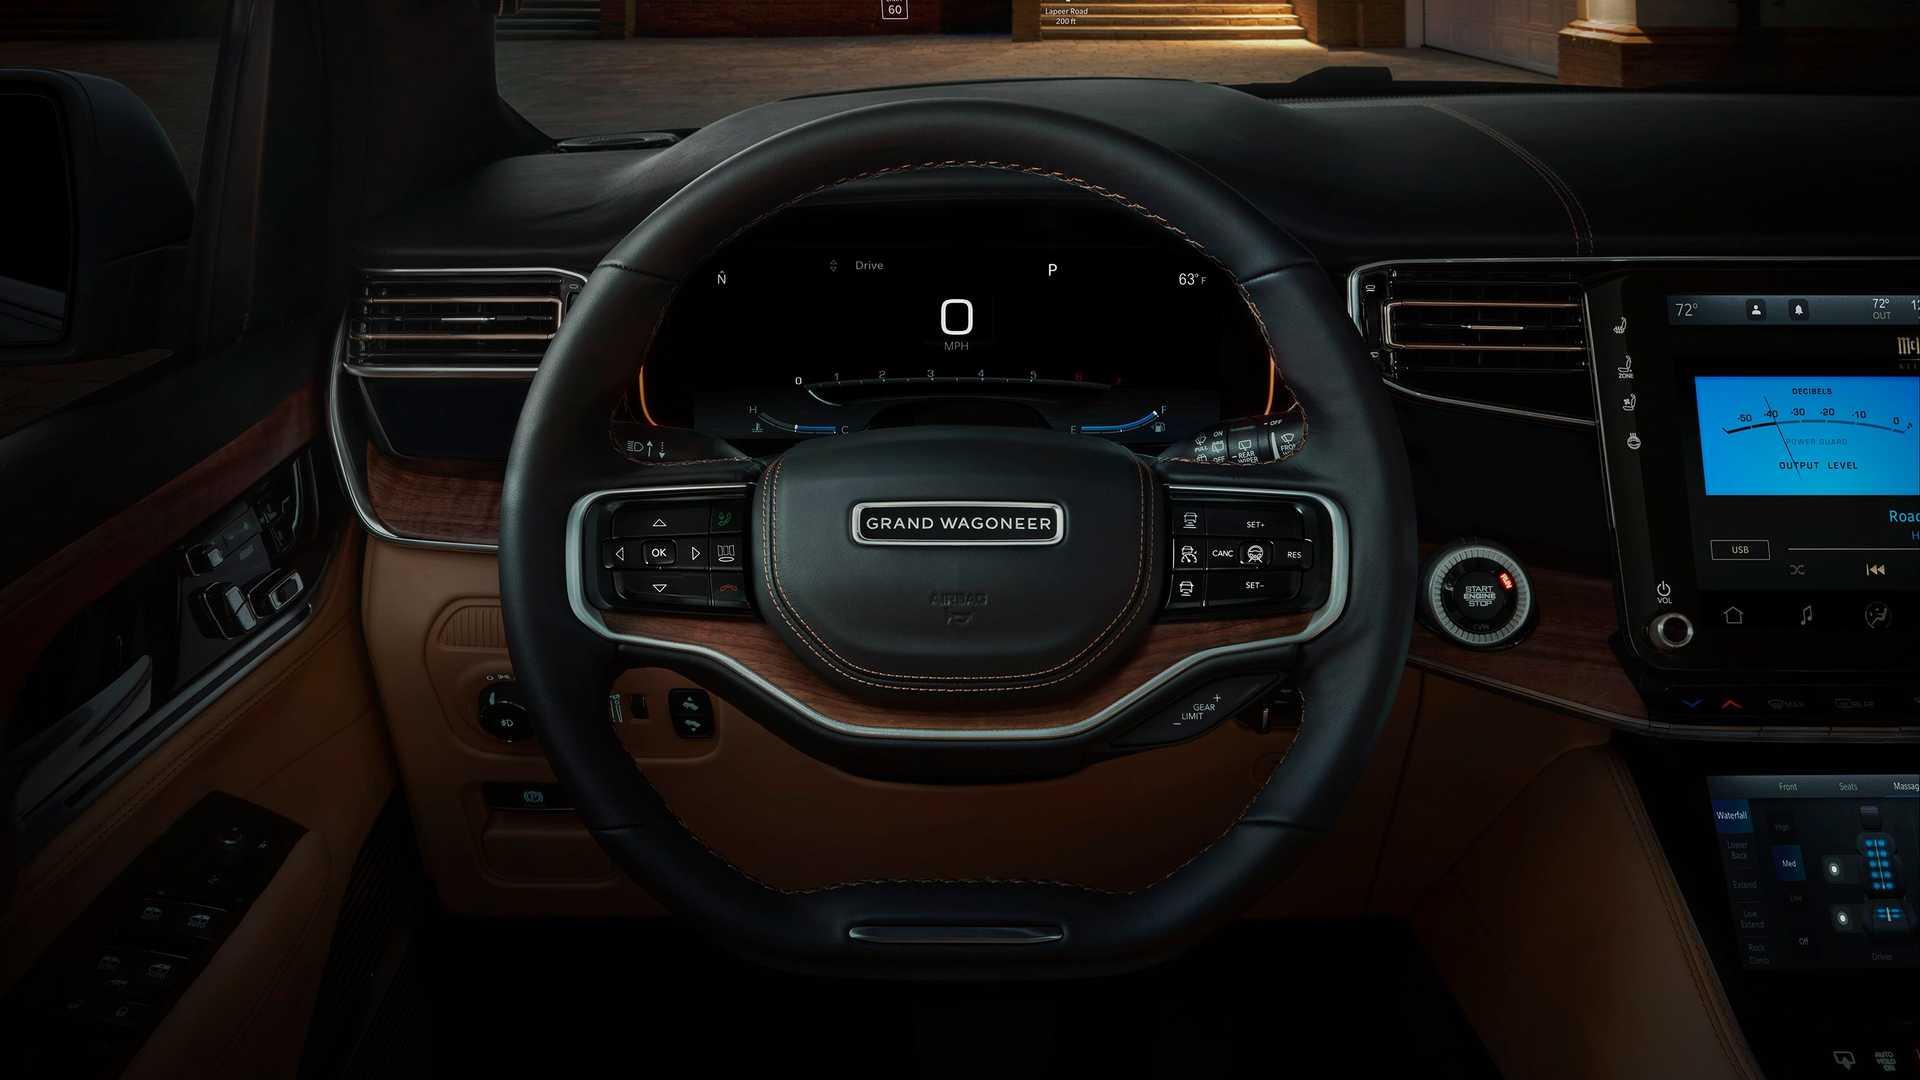 2022-jeep-grand-wagoneer-interior-steering-wheel